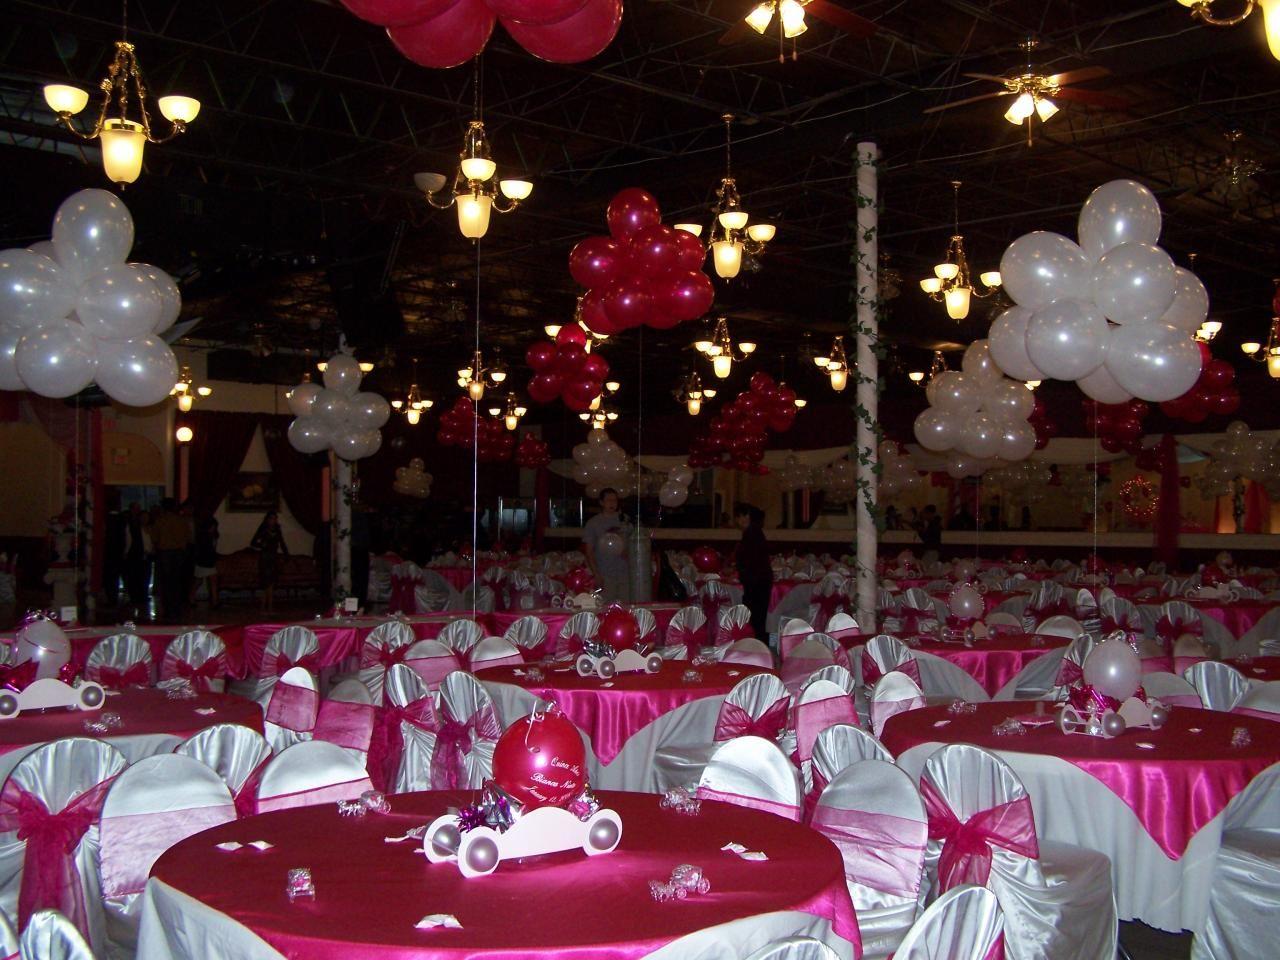 balloon inspiration for quinceanera | Balloon Centerpieces For Quinceaneras & balloon inspiration for quinceanera | Balloon Centerpieces For ...